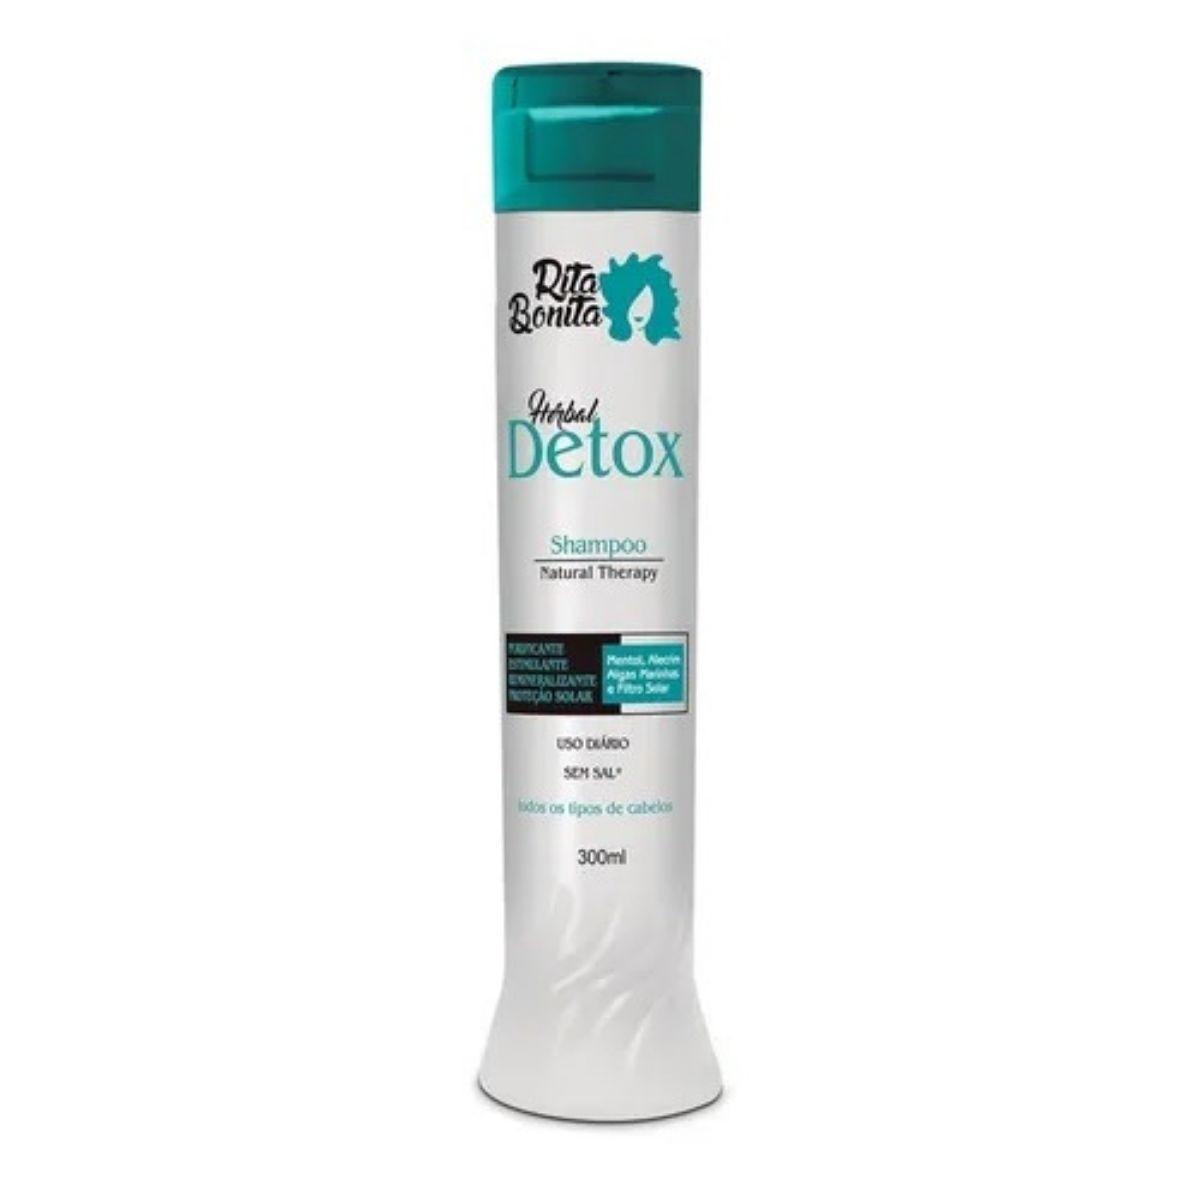 Herbal Detox - Shampoo Rita Bonita 300ml